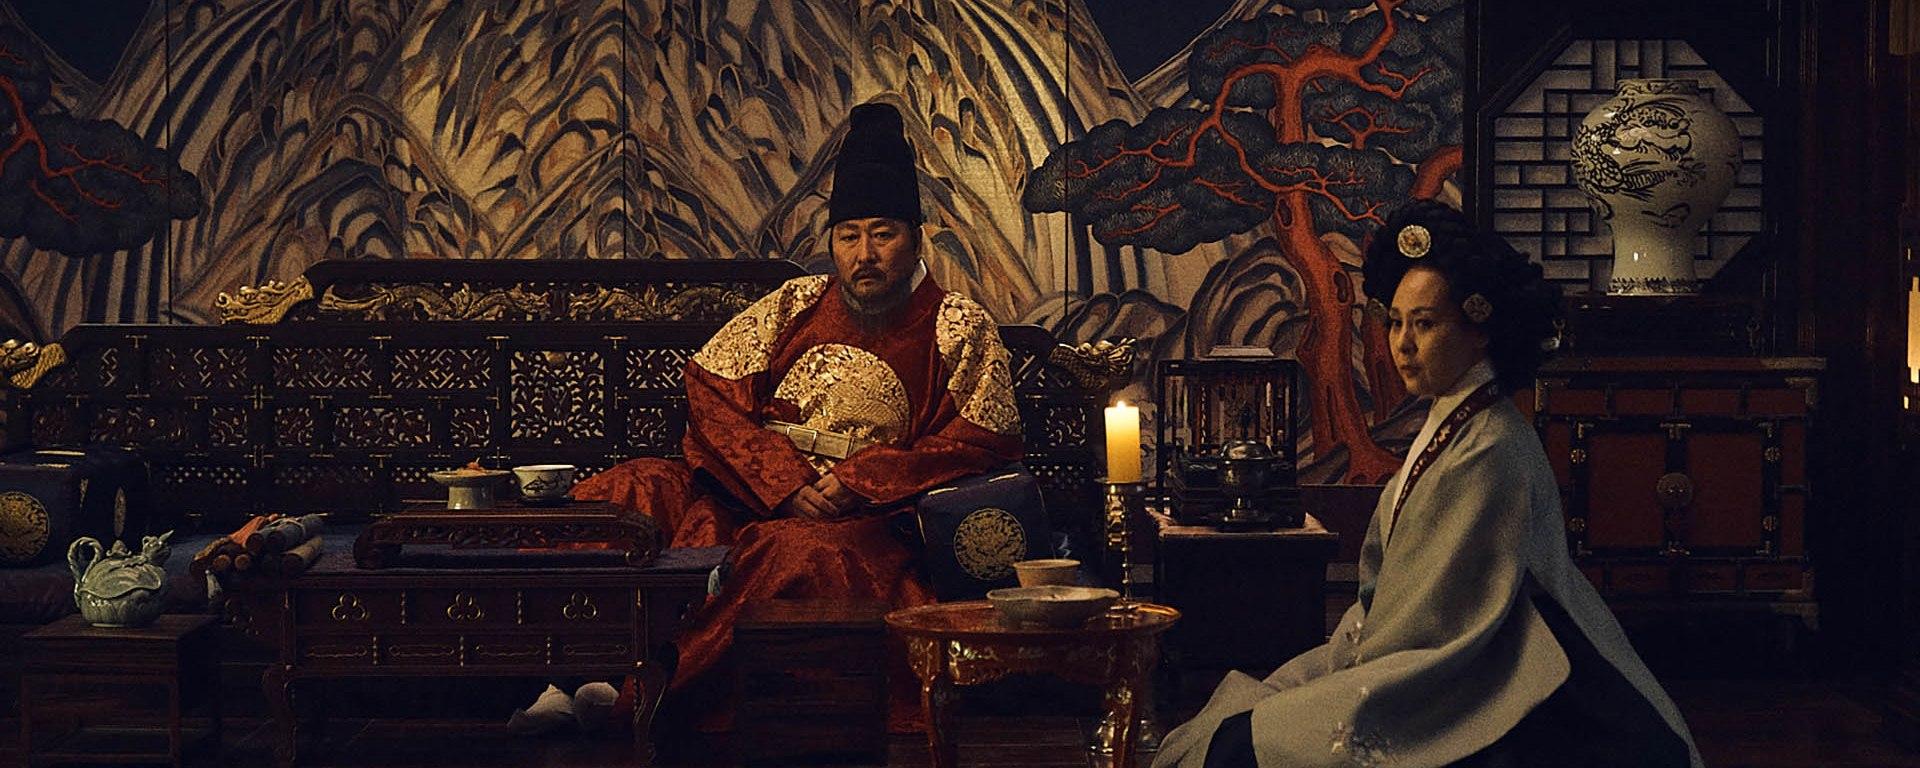 The King's Letters - CineFatti